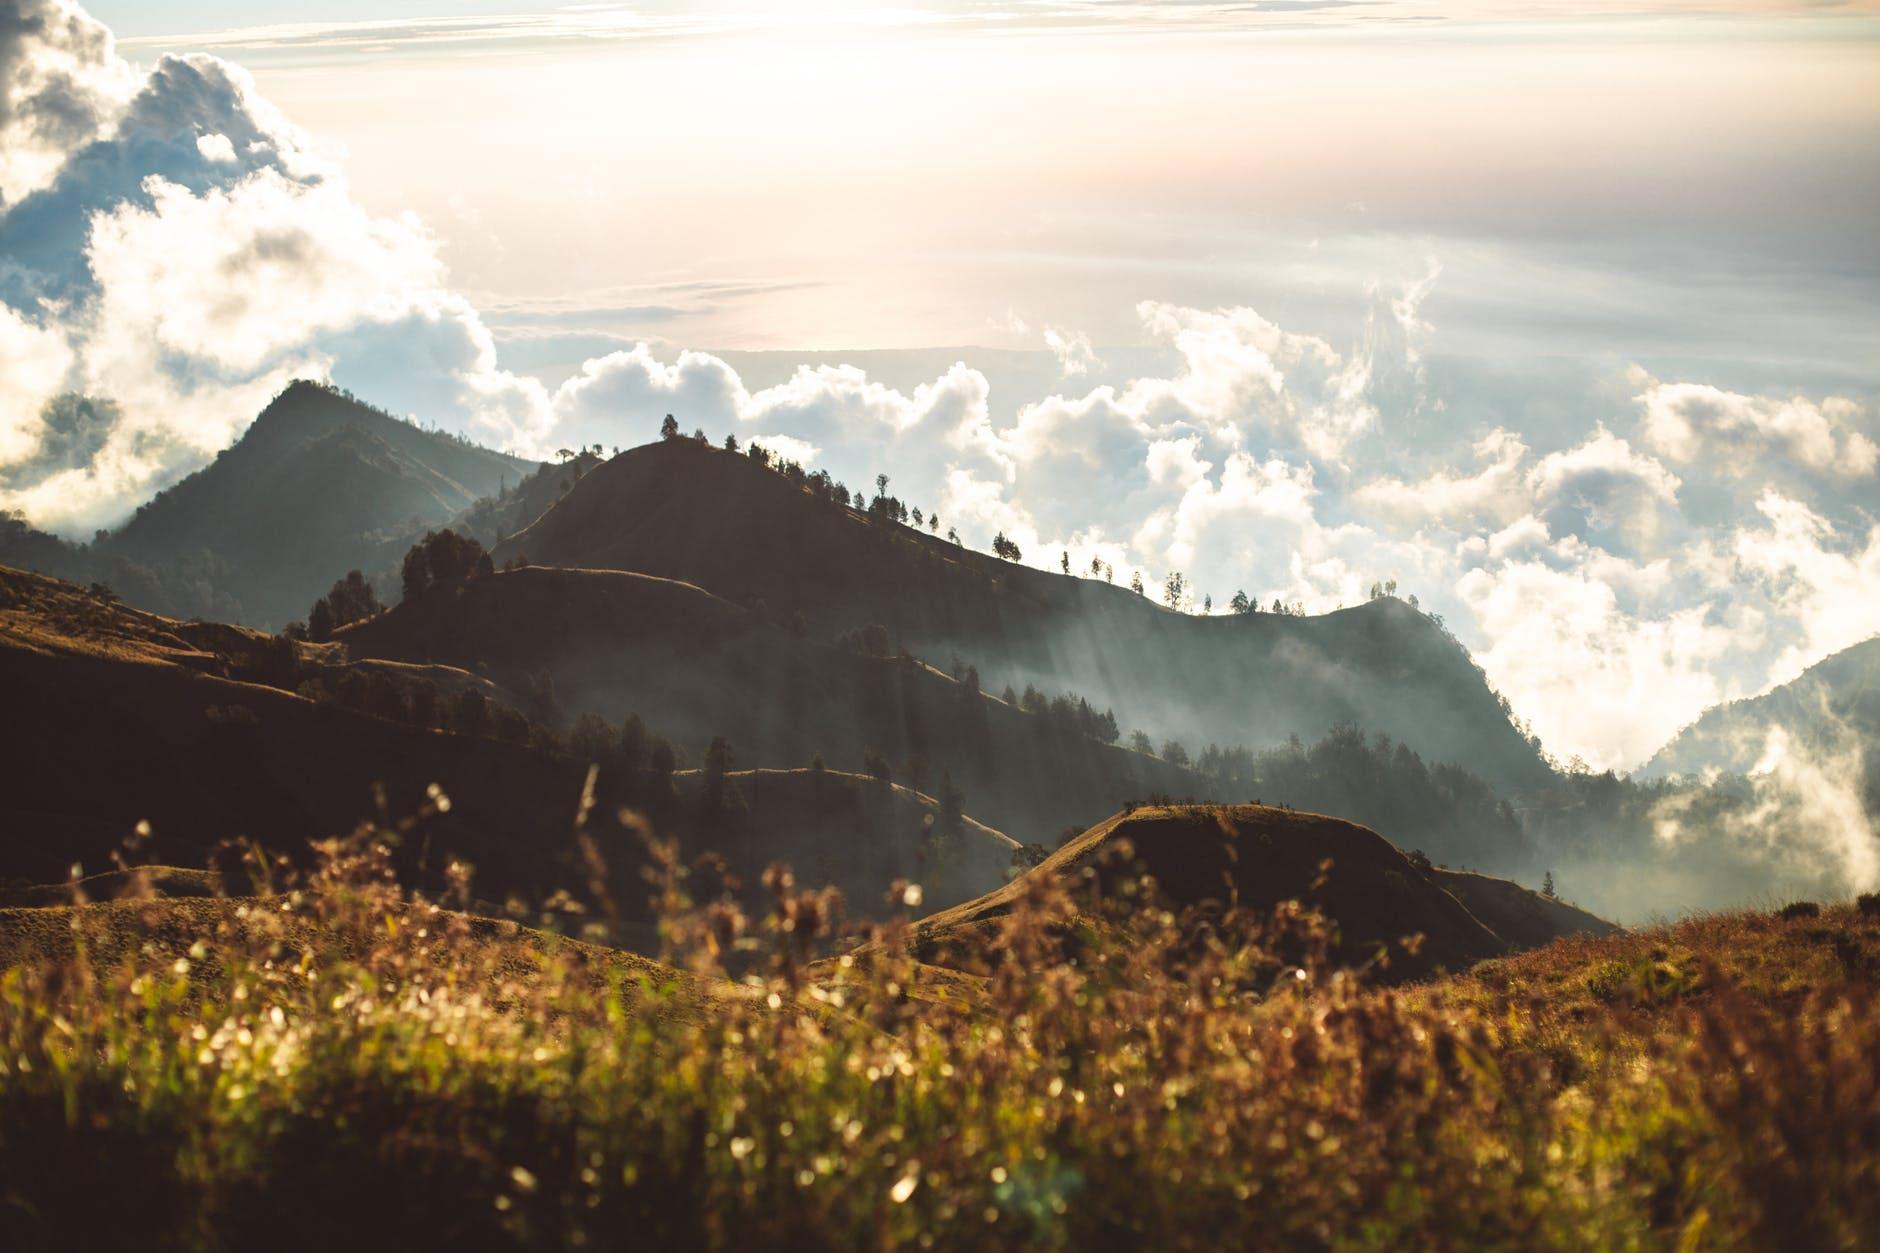 paisaje-naturaleza-cielo-puesta-de-sol - Photo by ROMAN ODINTSOV